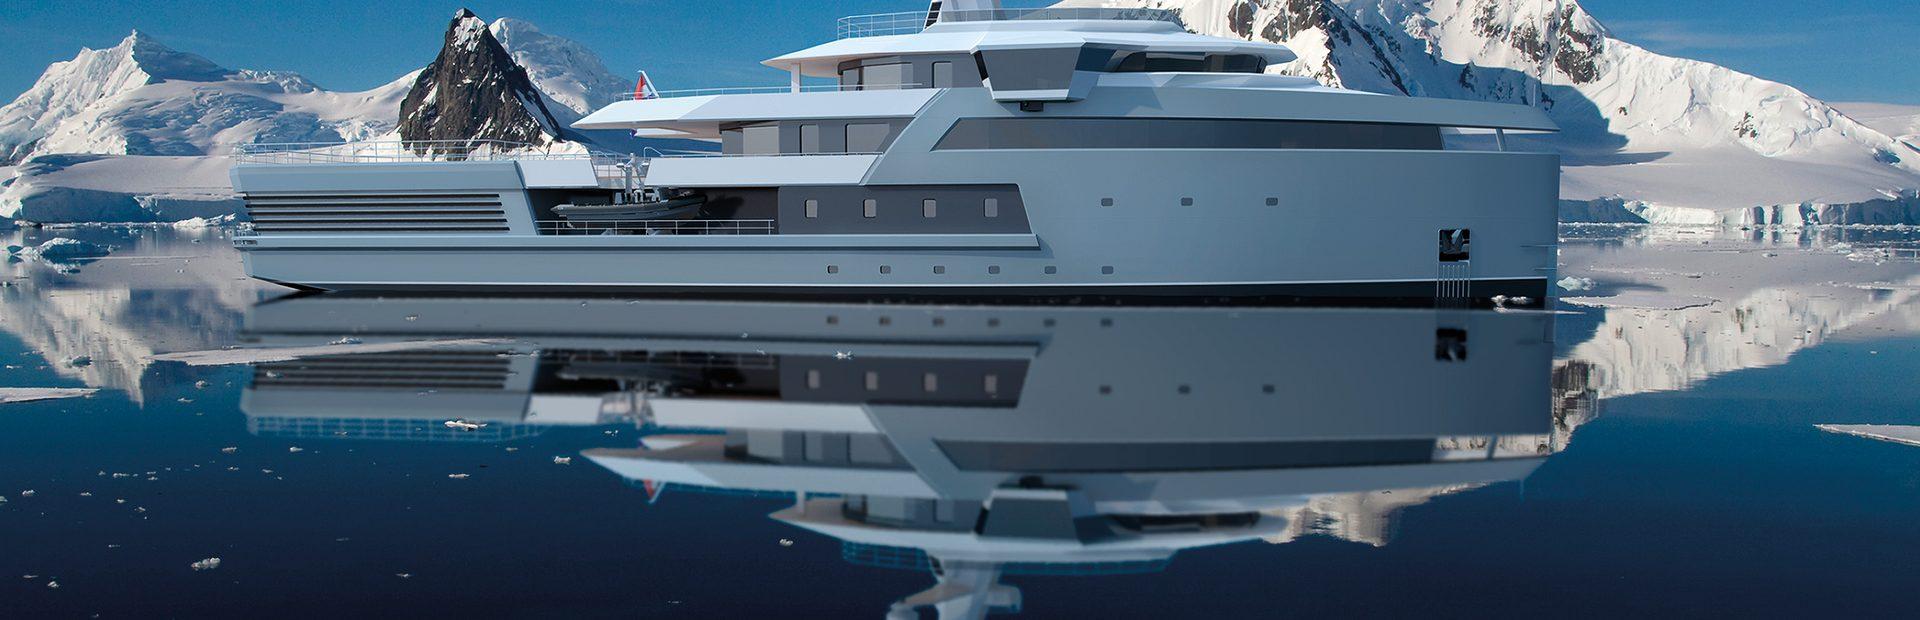 SeaXplorer 65 Yacht Charter